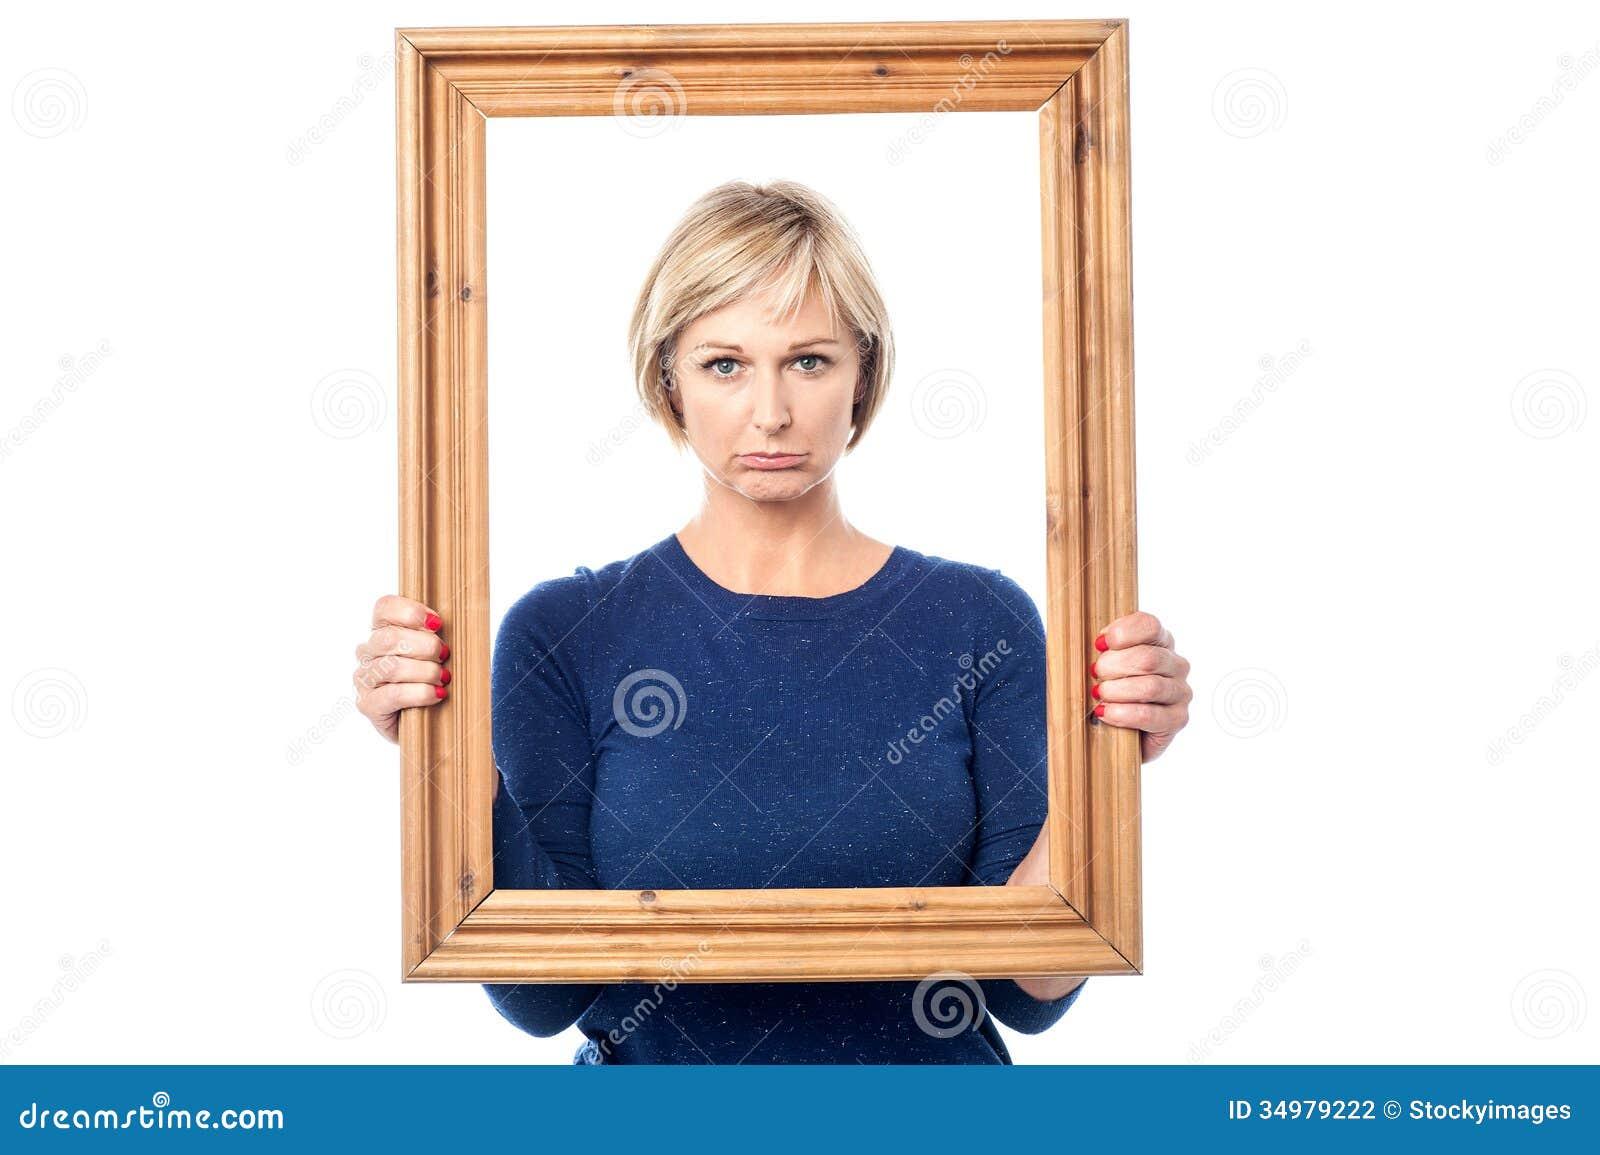 Woman holding frame. stock photo. Image of framed, holding - 2678186